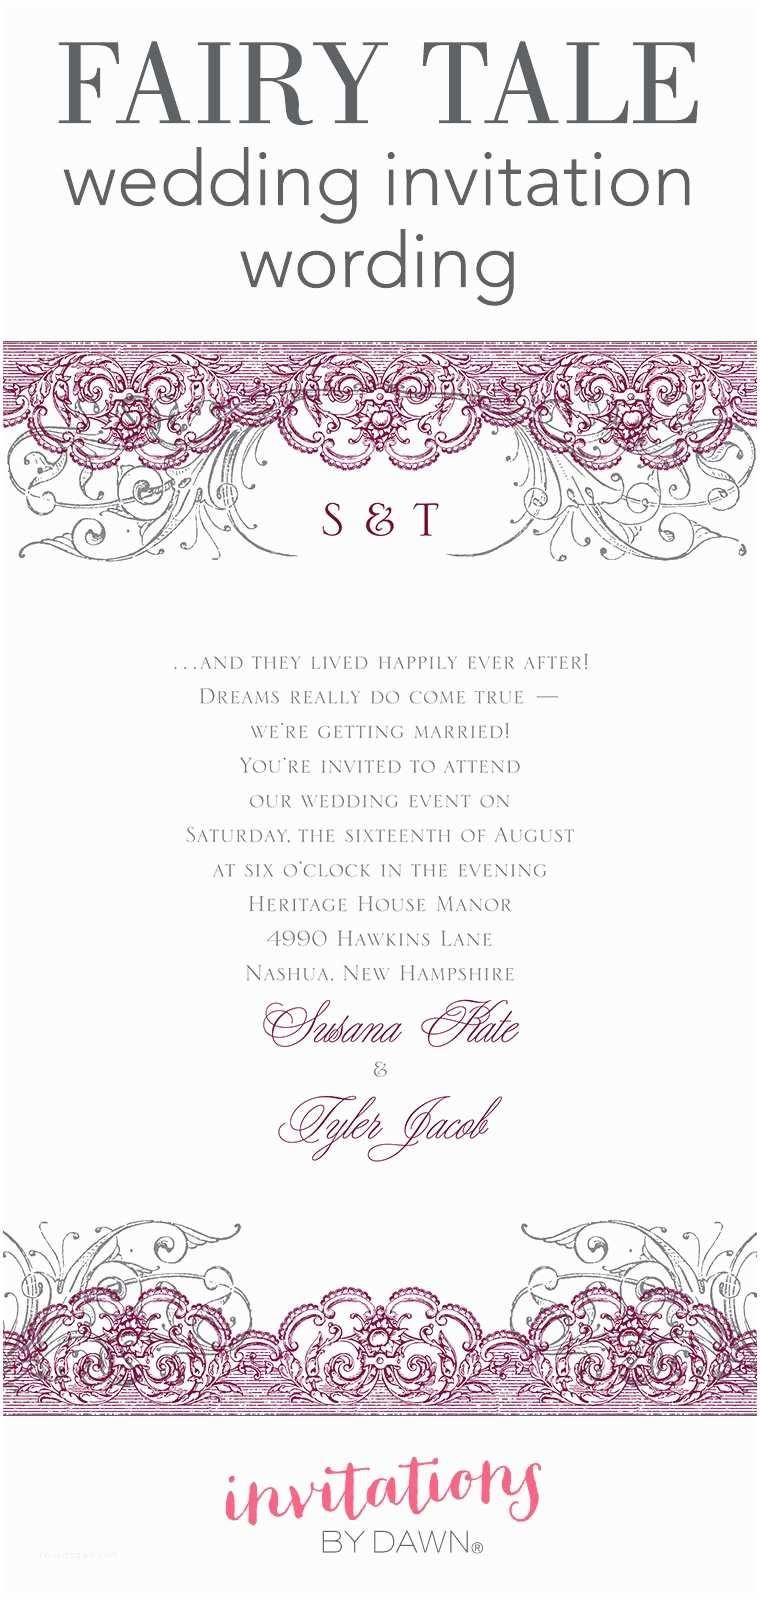 Wedding Invitation Poems Fairy Tale Wedding Invitation Wording